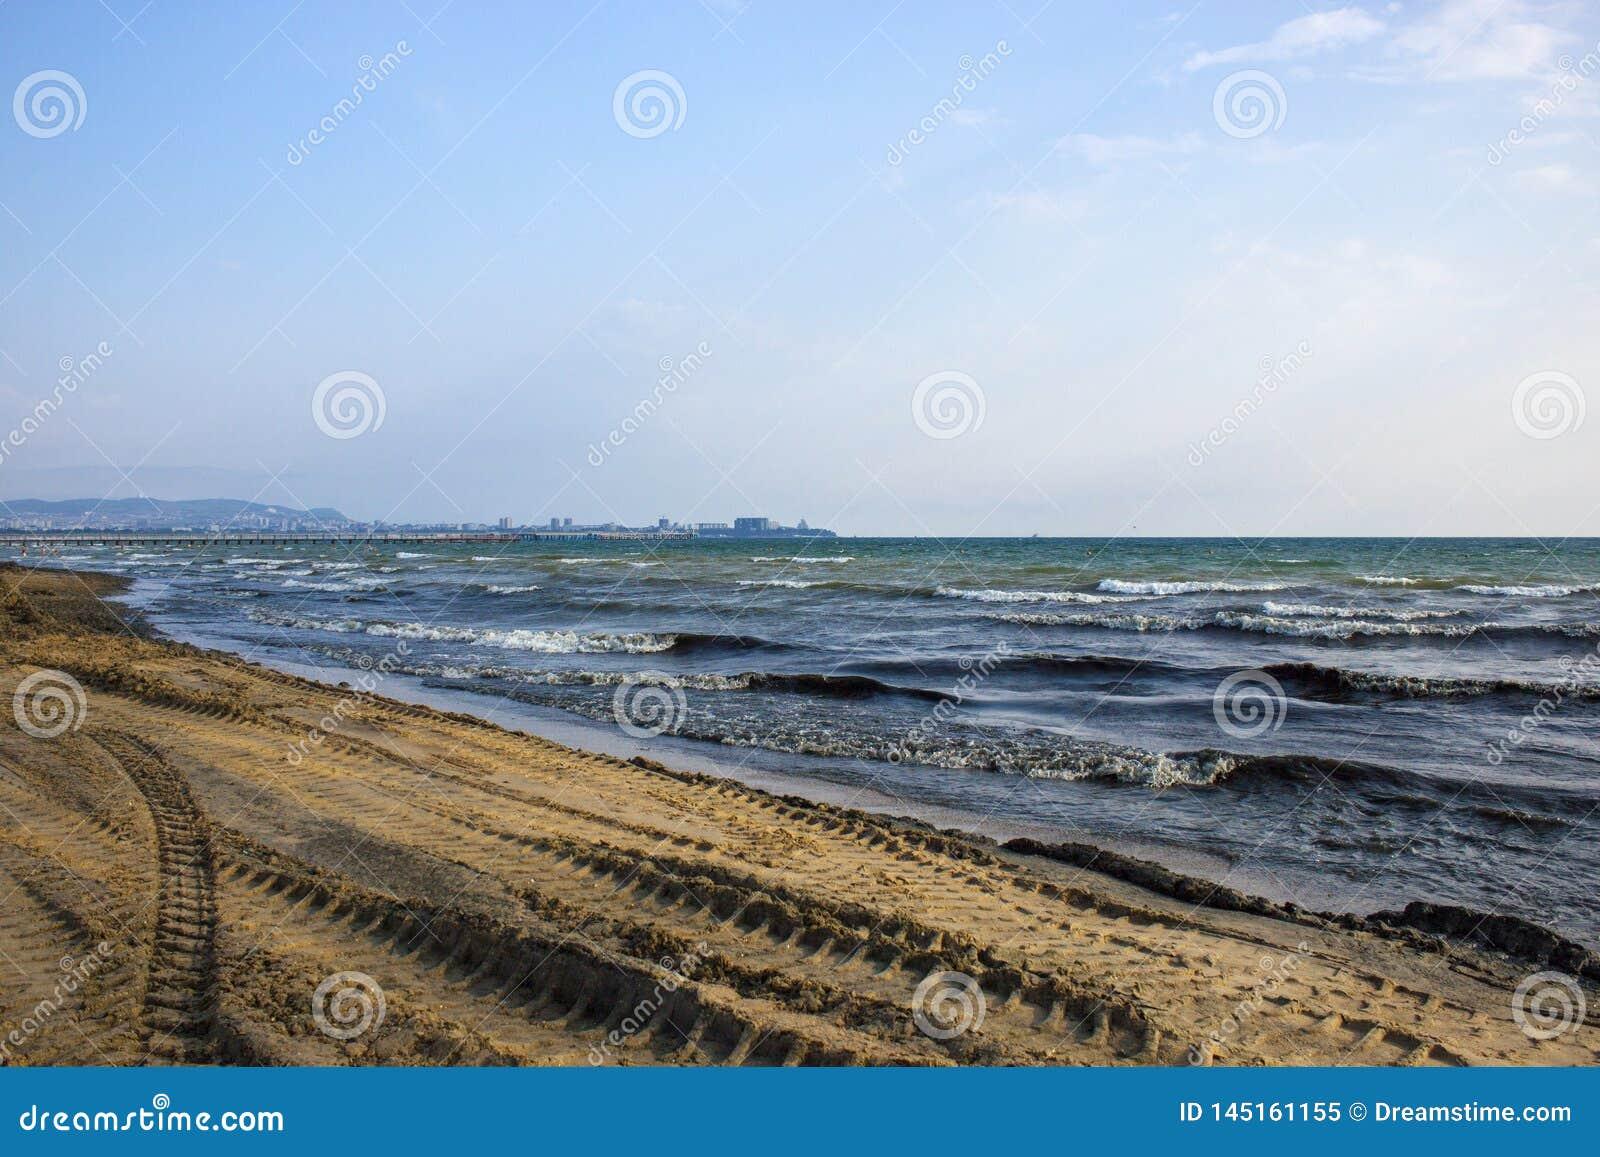 Trilha do trator na praia